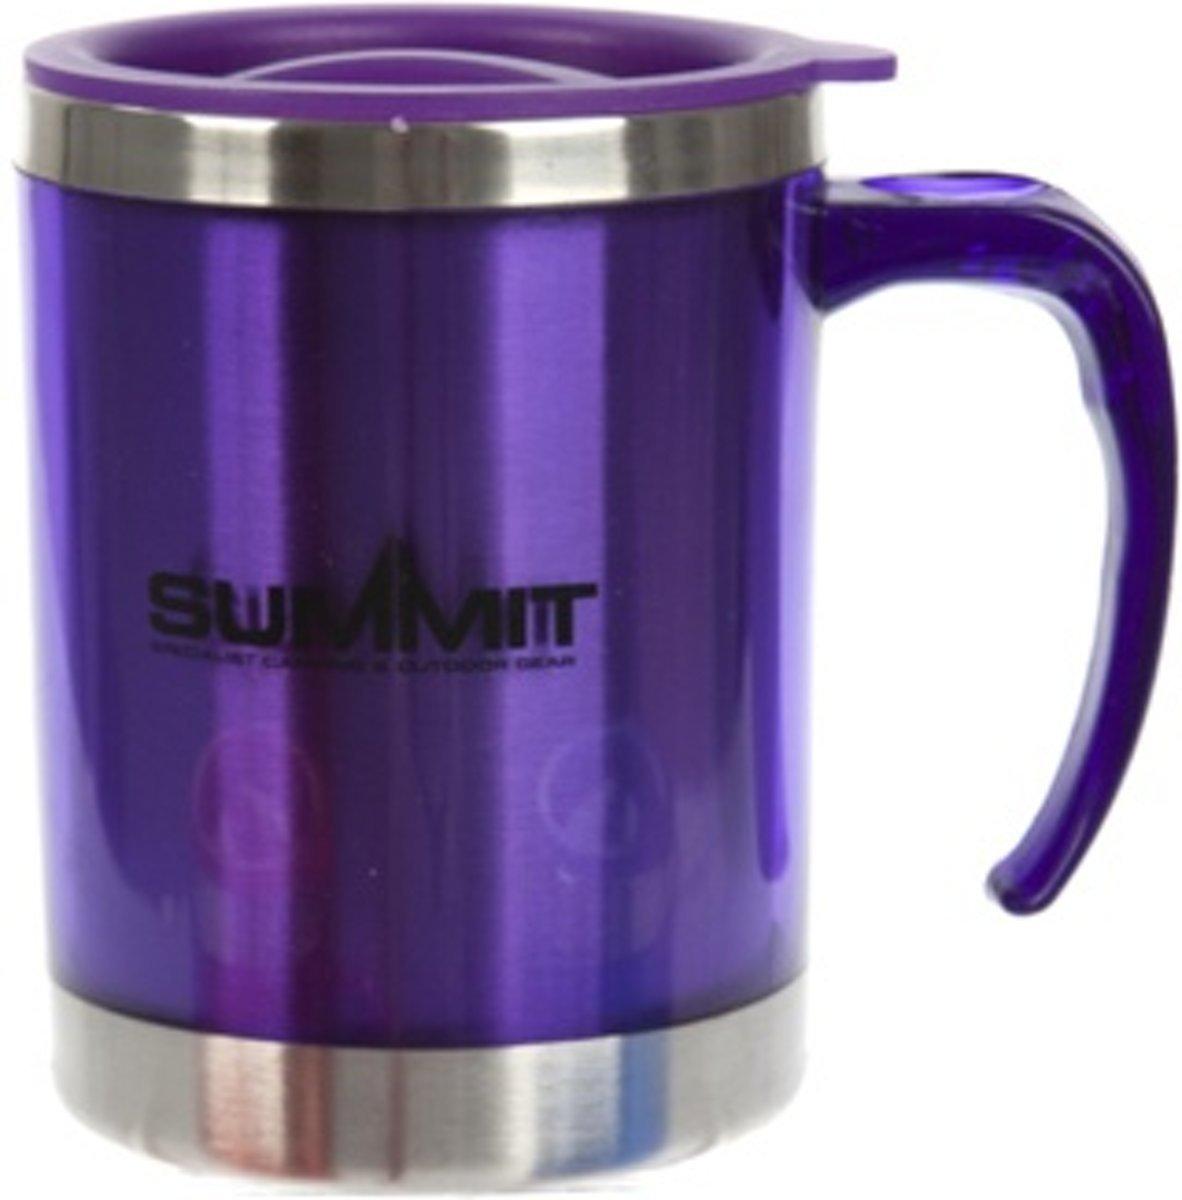 Summit Drinkbeker Met Deksel Aluminium Paars 450 Ml kopen